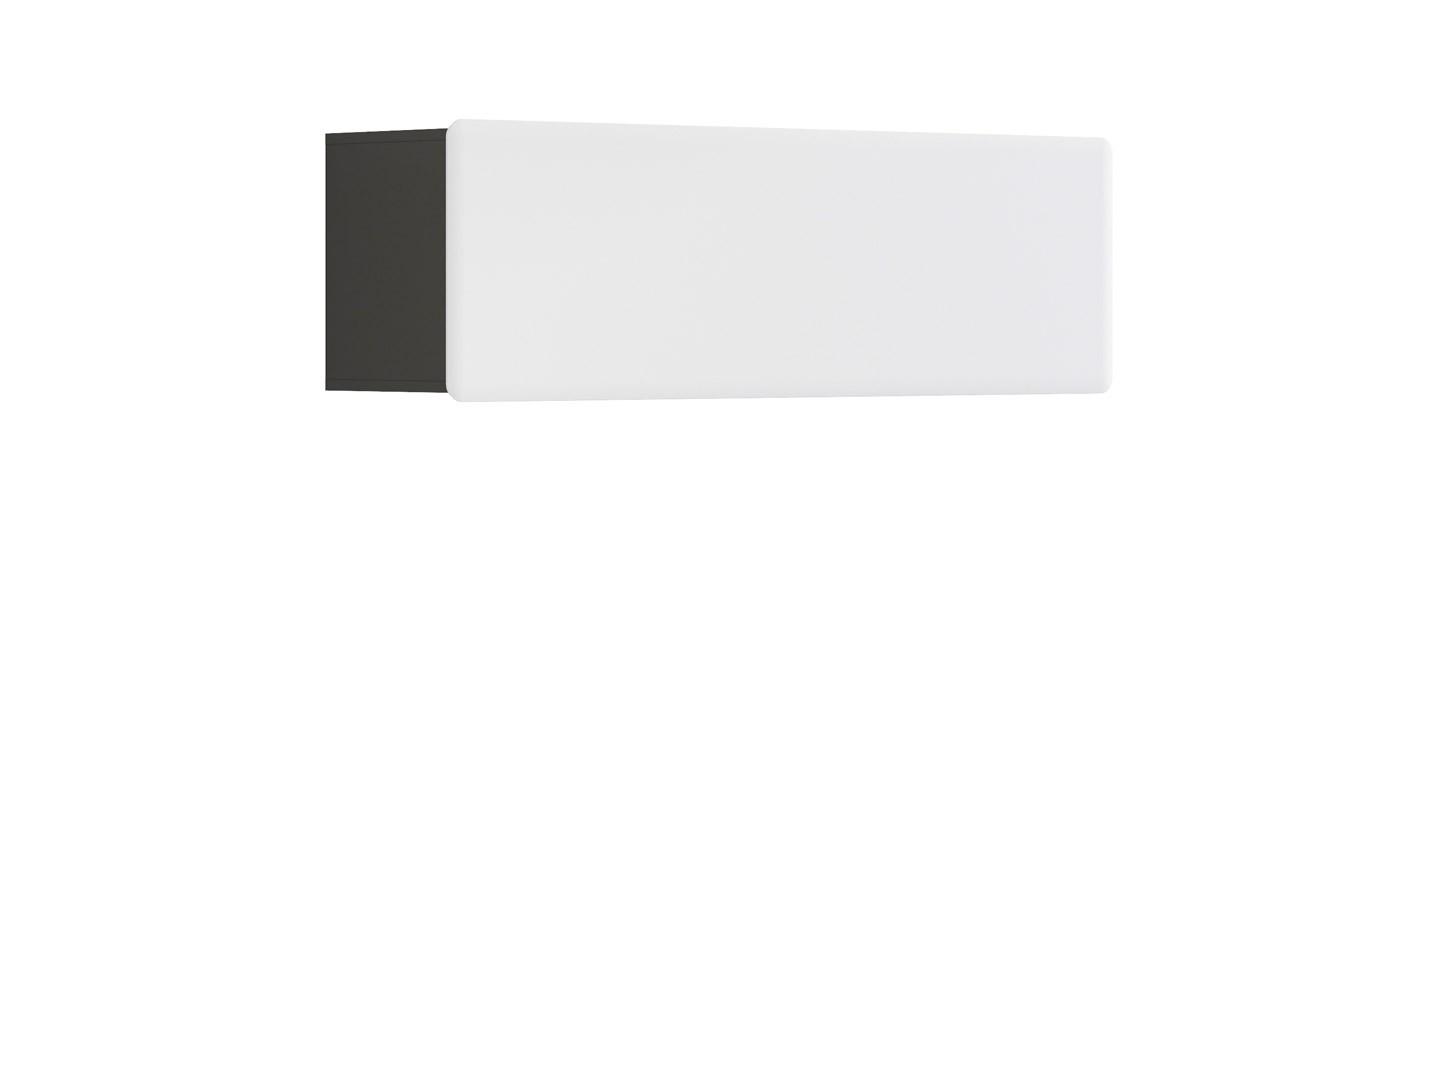 Polička - BRW - Possi Light - SFW1K/4/13 (šedý wolfram + lesk bílý)